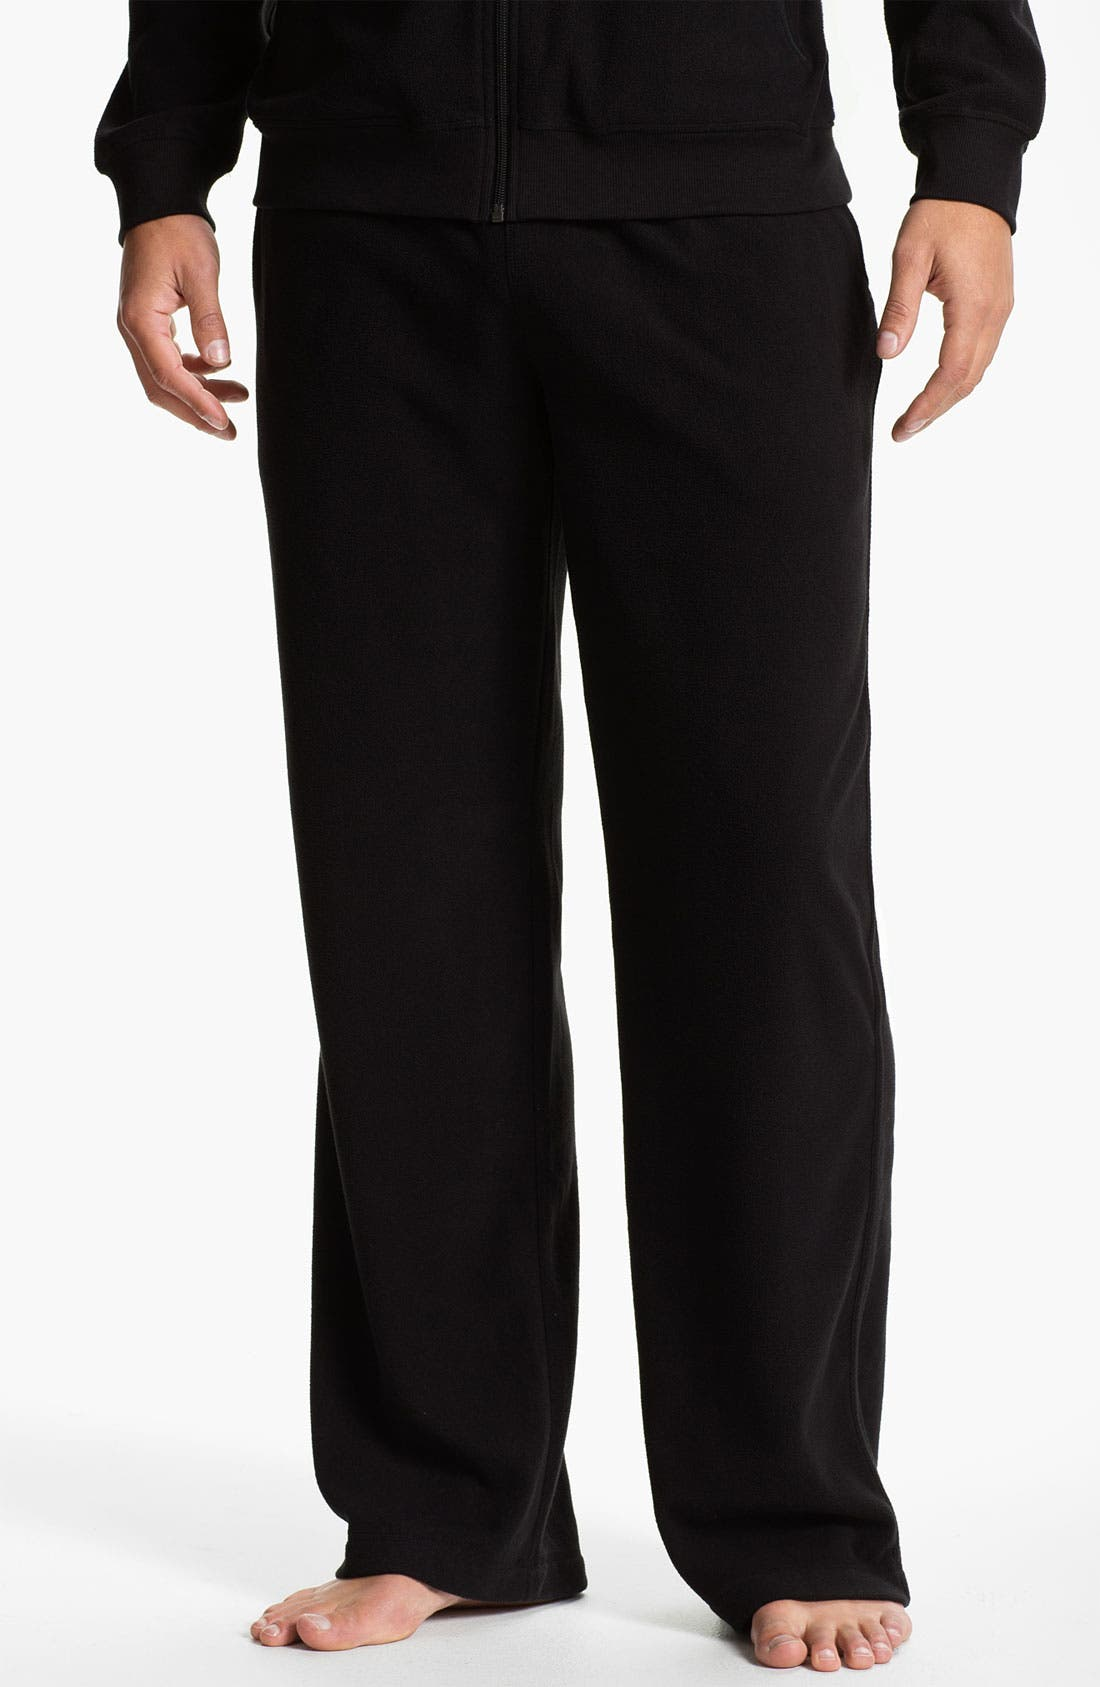 Alternate Image 1 Selected - Daniel Buchler Lightweight Fleece Lounge Pants